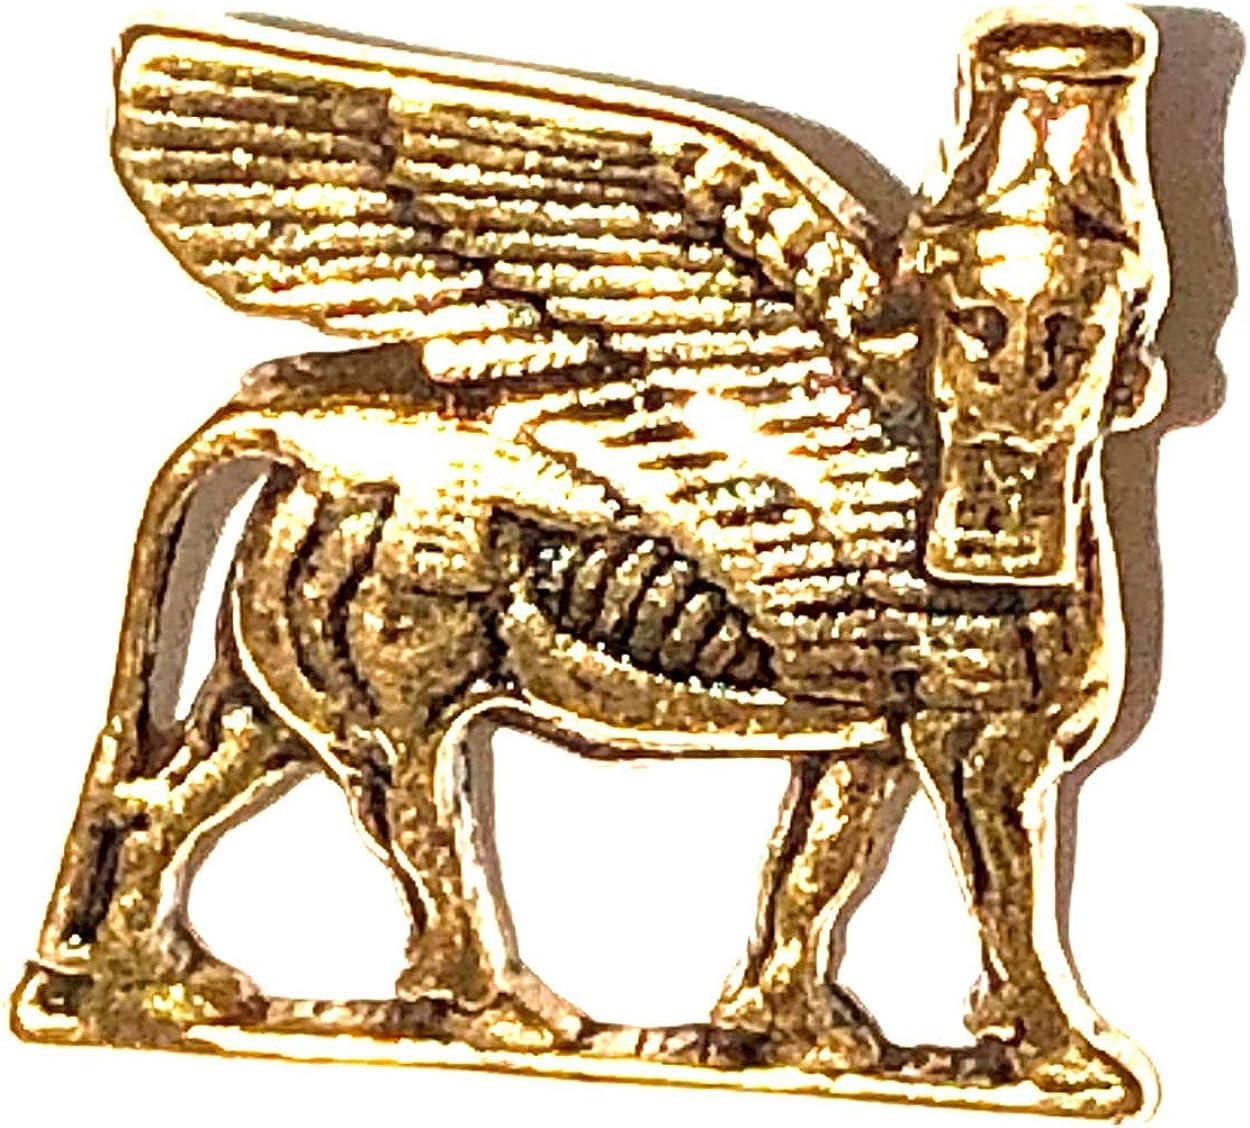 Assyrian Neoclassical Lamassu Winged Bull Tie Ha Charlotte Mall Lapel Pin Tack security